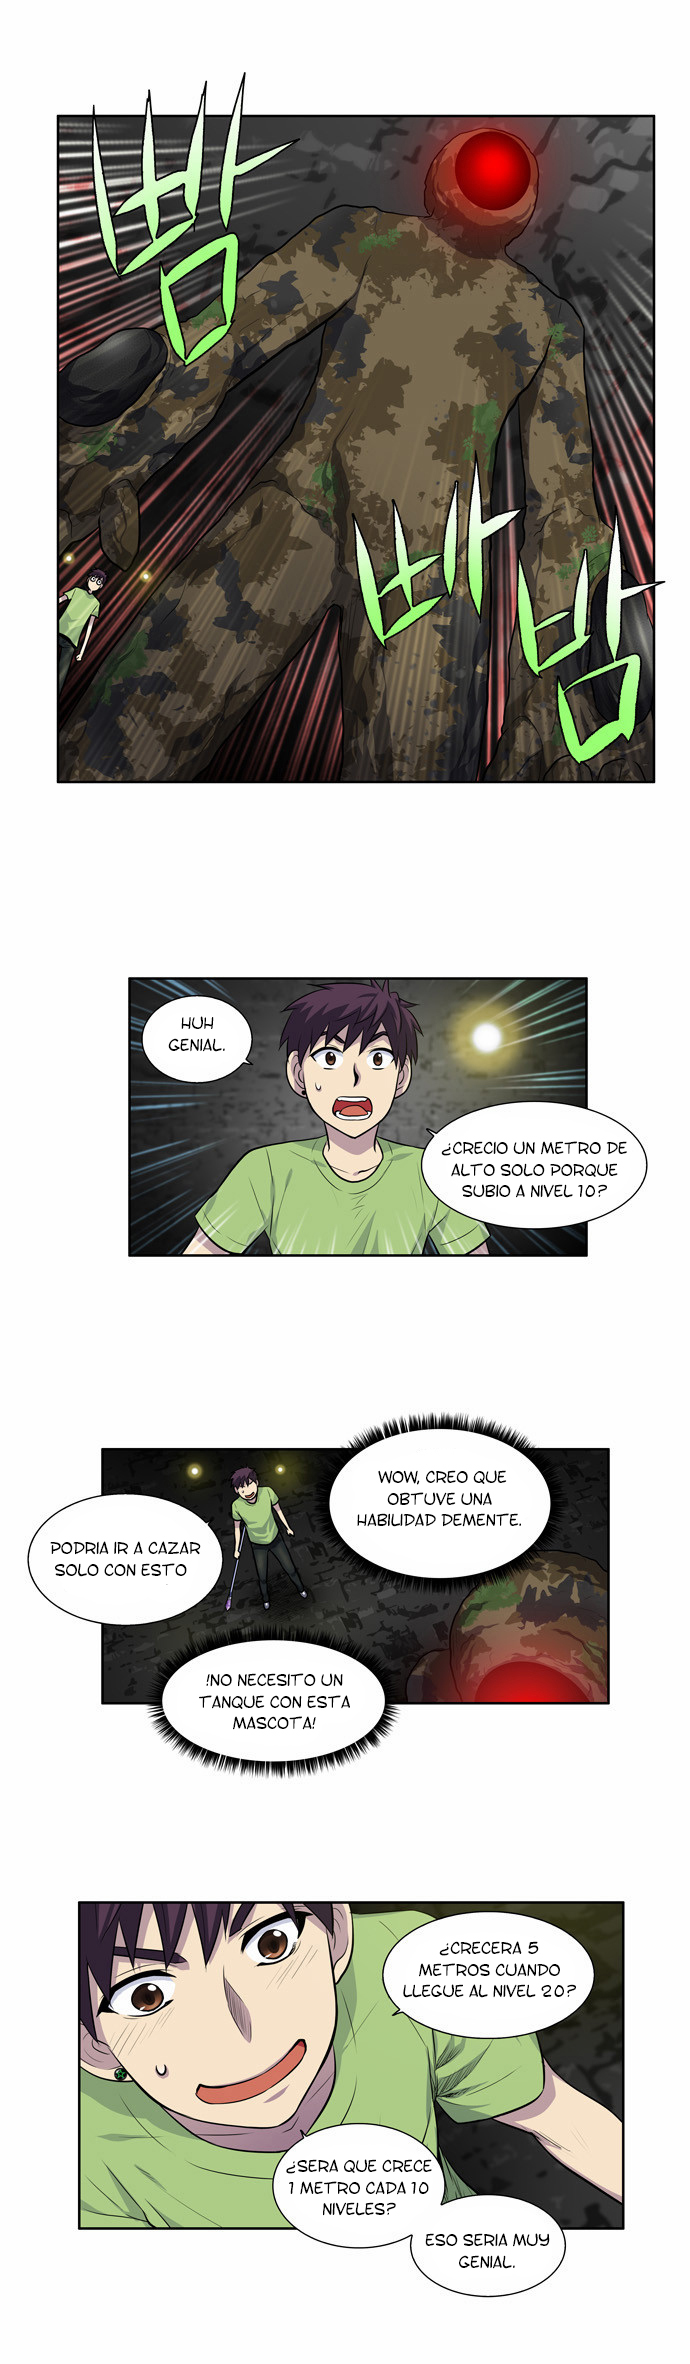 http://c5.ninemanga.com/es_manga/61/1725/420034/aa839cfb74f9e5ae2a89572a0093dd58.jpg Page 5